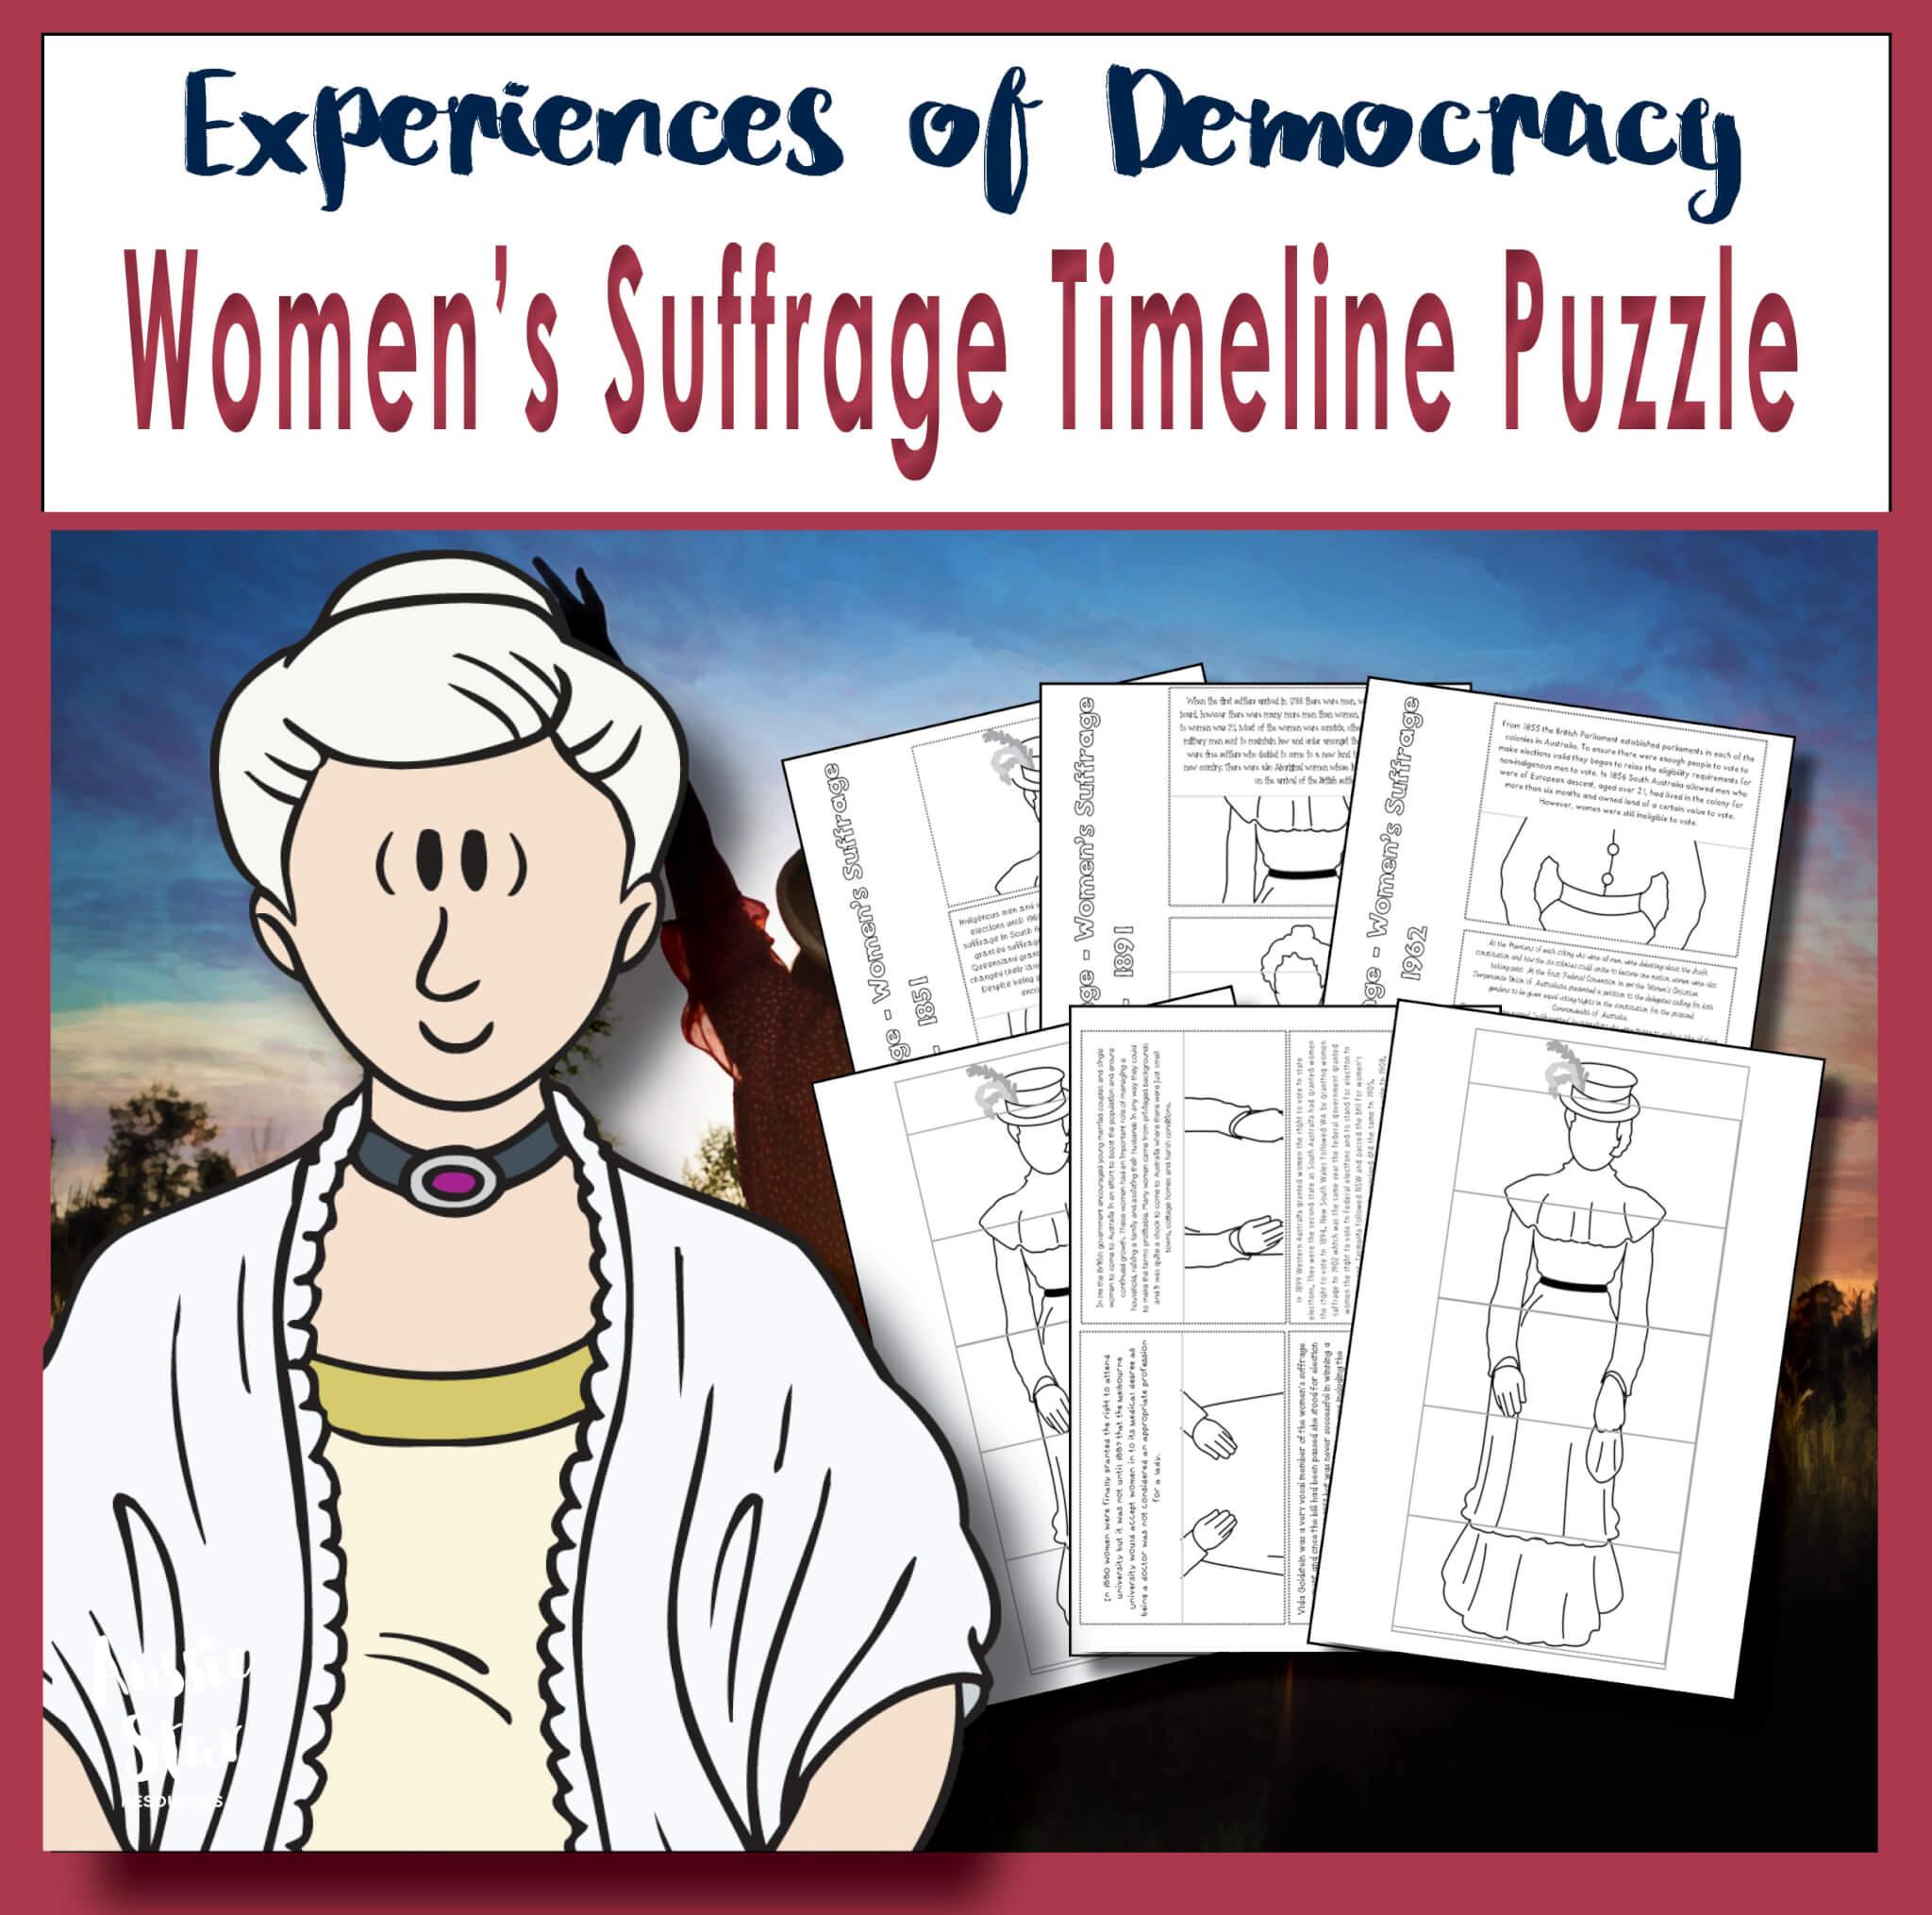 women's suffrage timeline puzzle activity